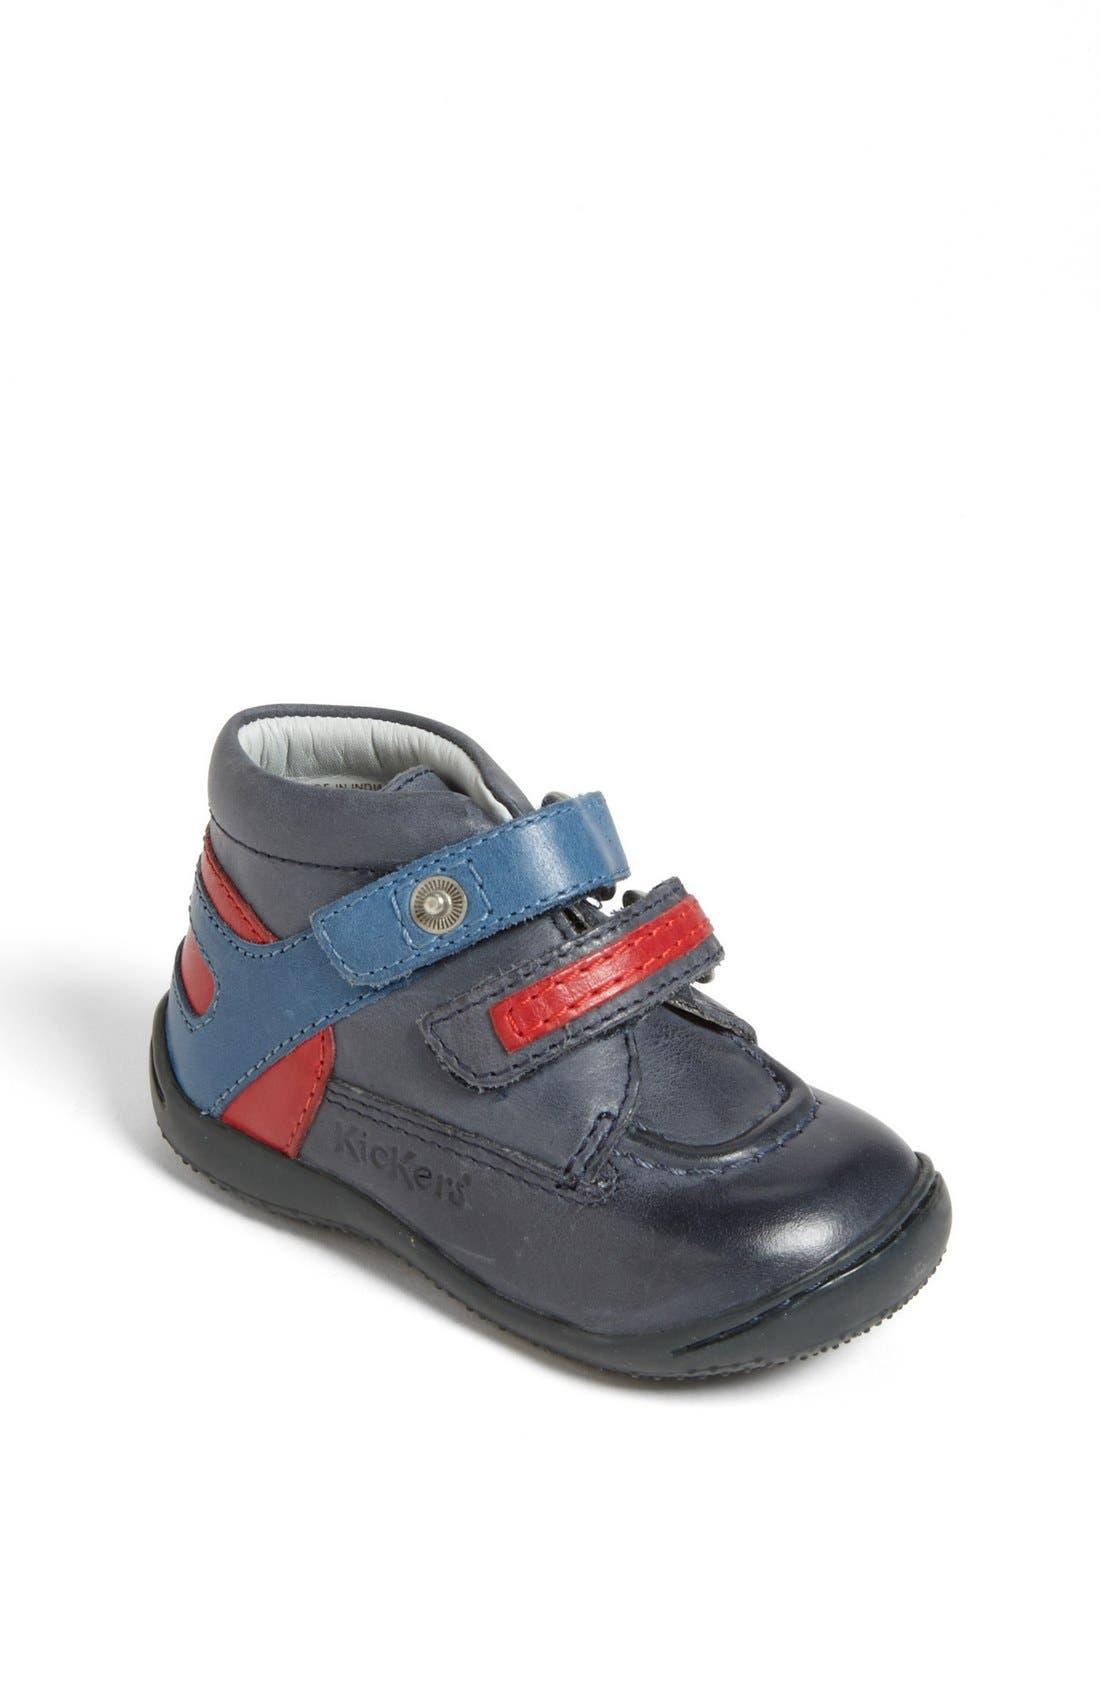 Alternate Image 1 Selected - Kickers 'Geneva' Boot (Baby, Walker & Toddler)